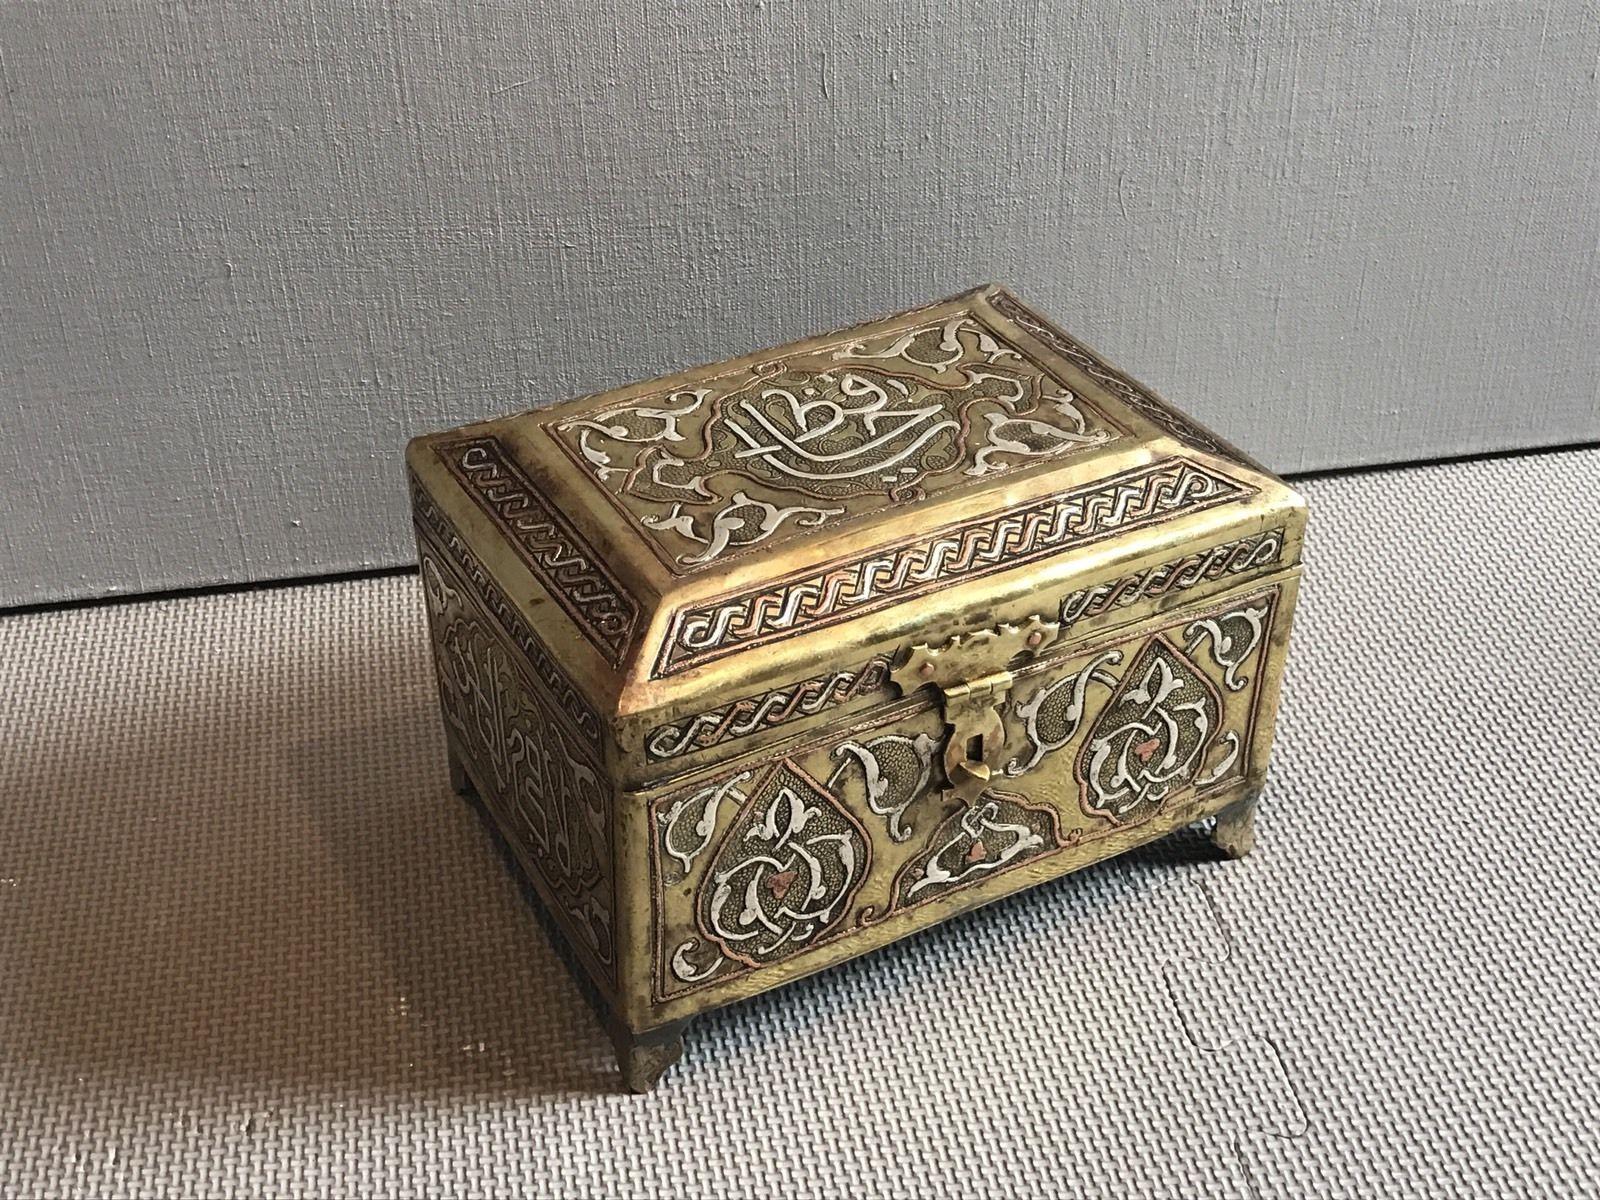 teremokok_antiques_cairoware_box_1.jpg